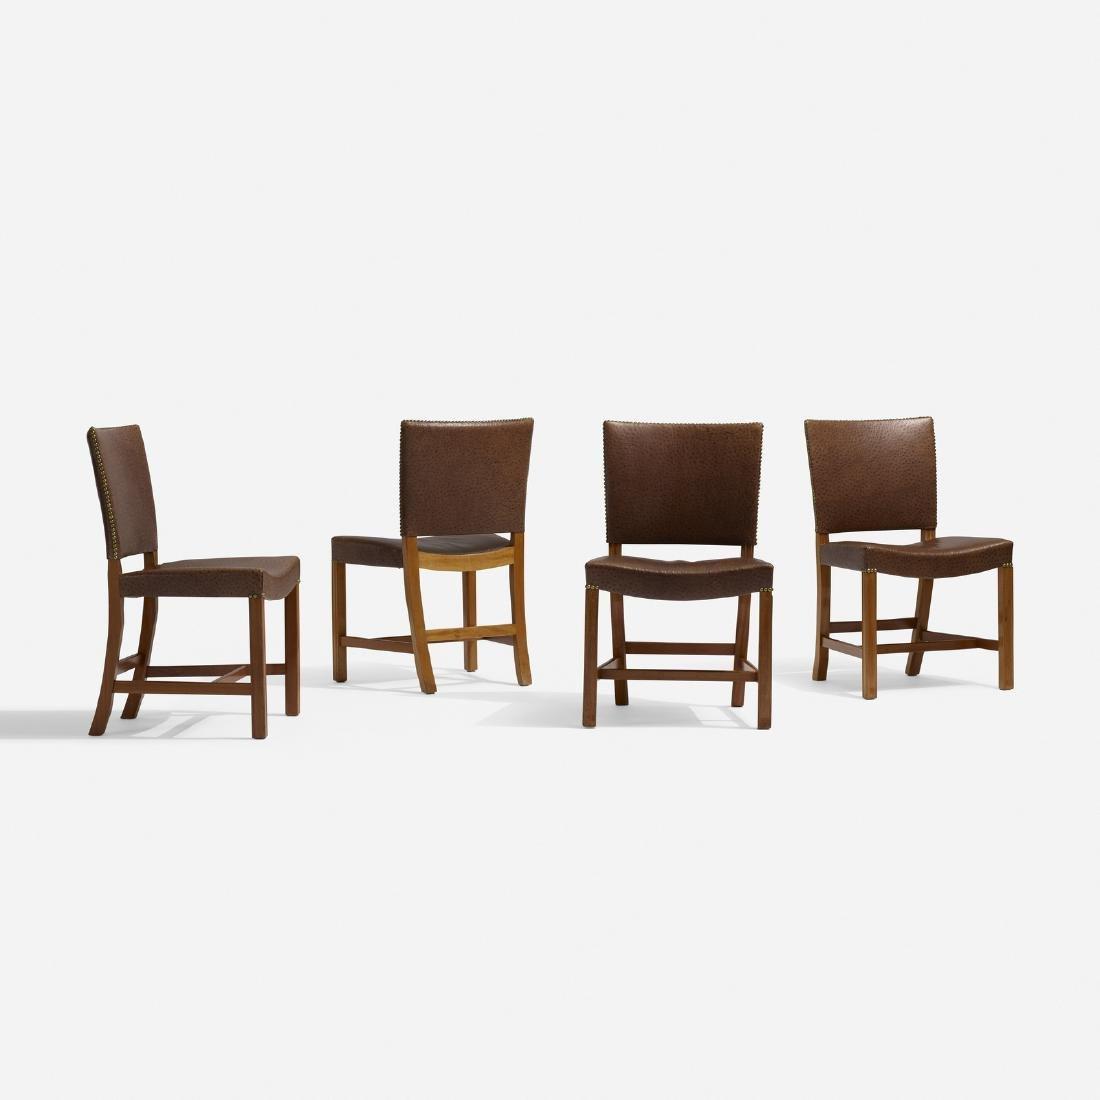 Kaare Klint, Barcelona chairs model 3758, set of four